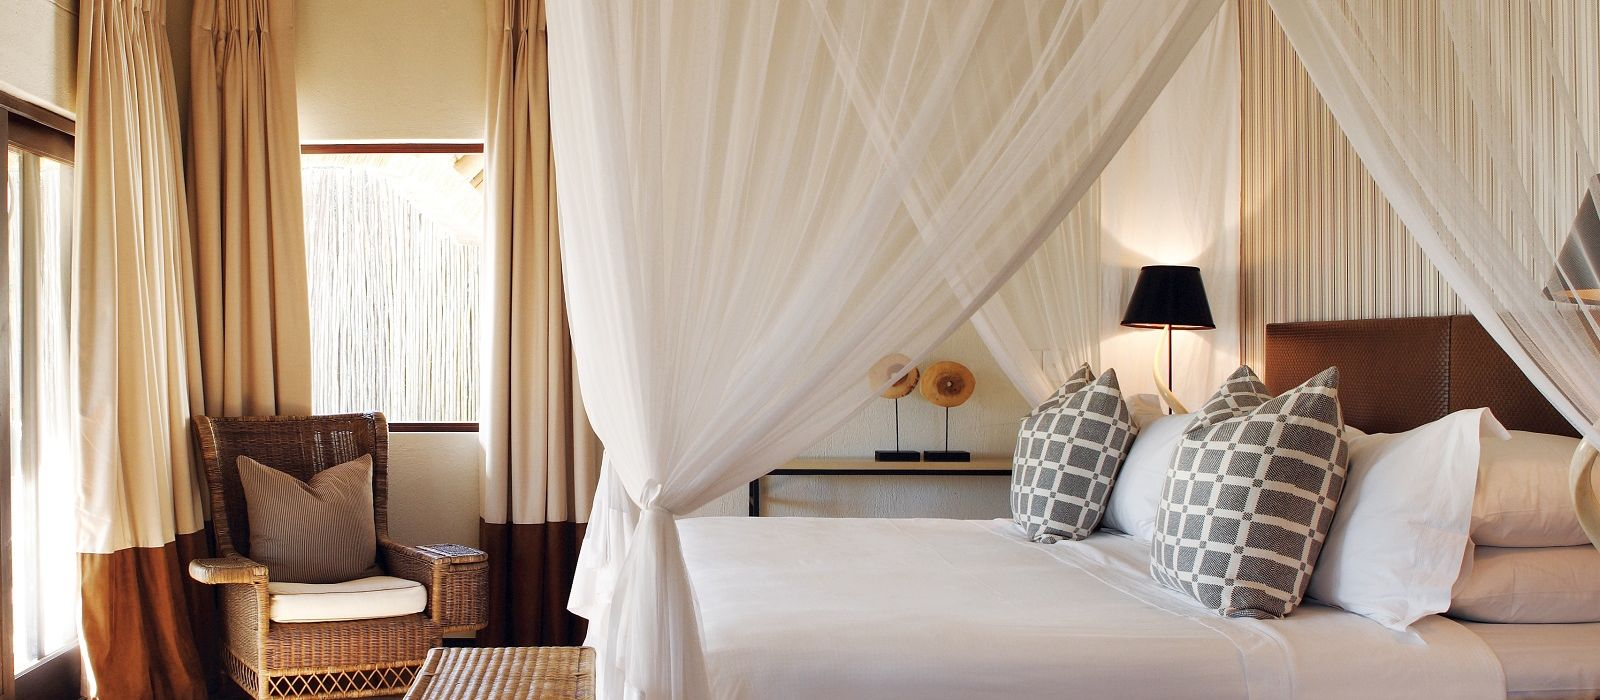 Hotel Londolozi Pioneer Camp South Africa